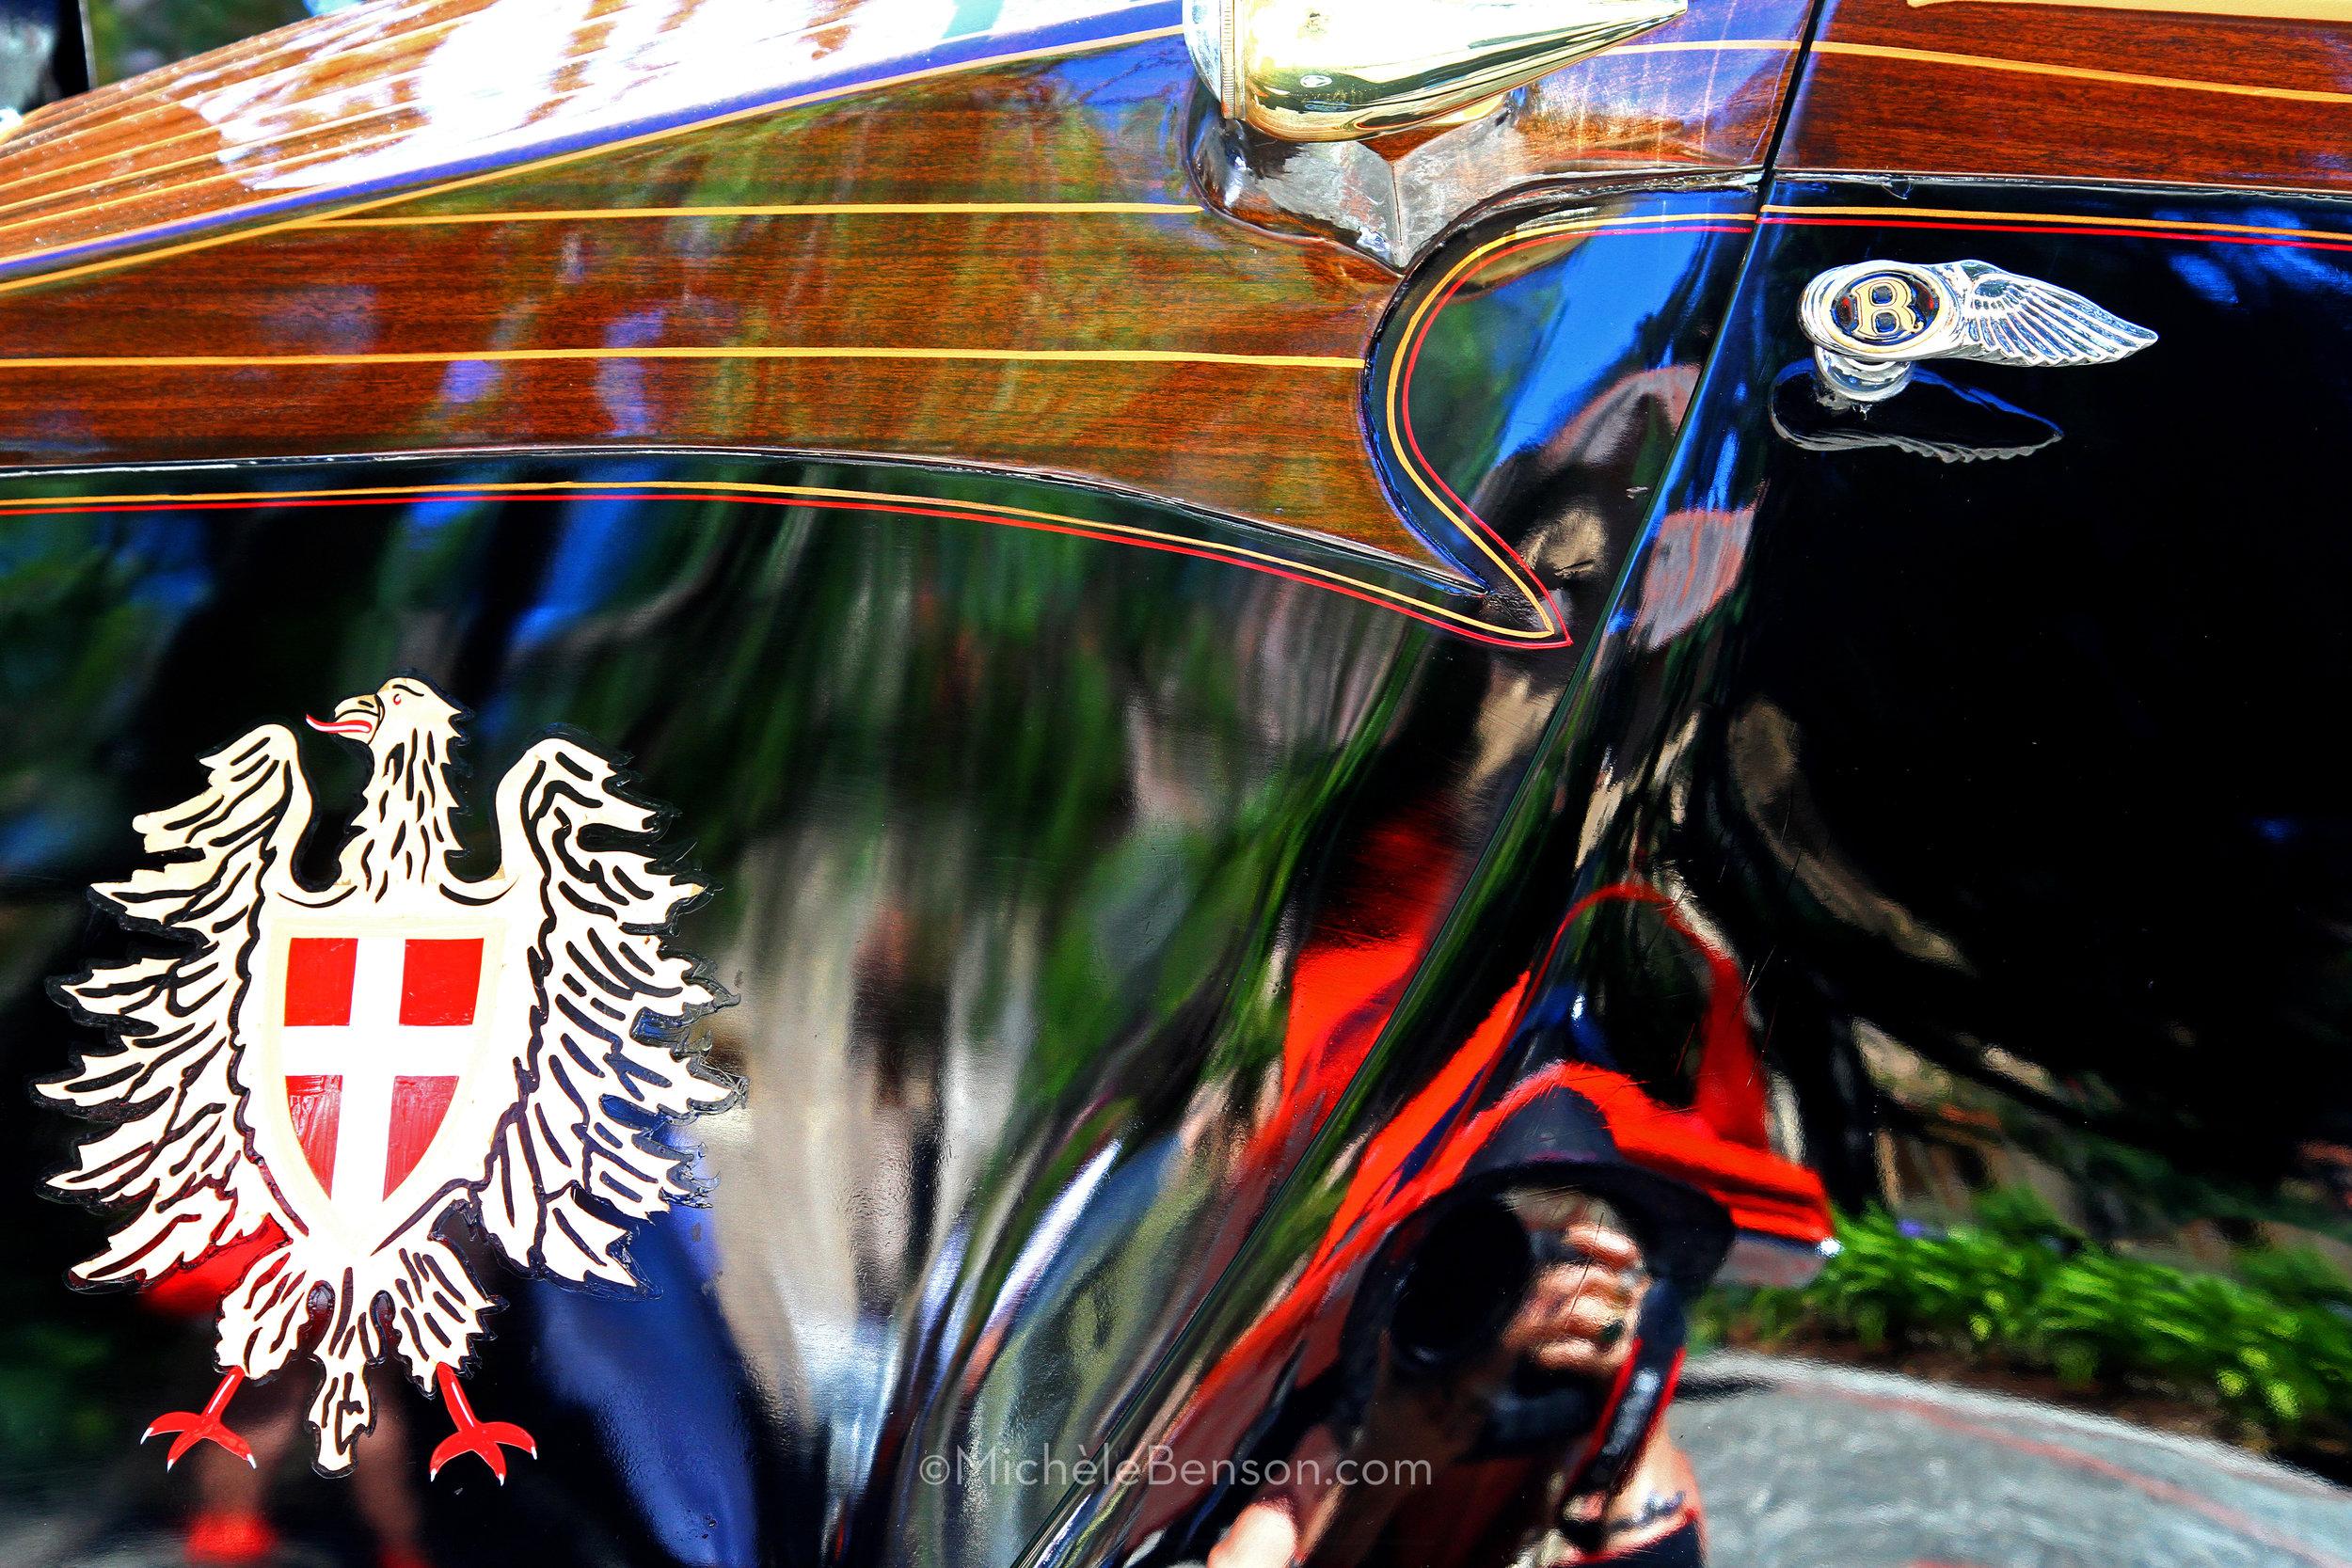 1917 America La France Type 12 La Beastie 1 Rusty Carmel, California 2015